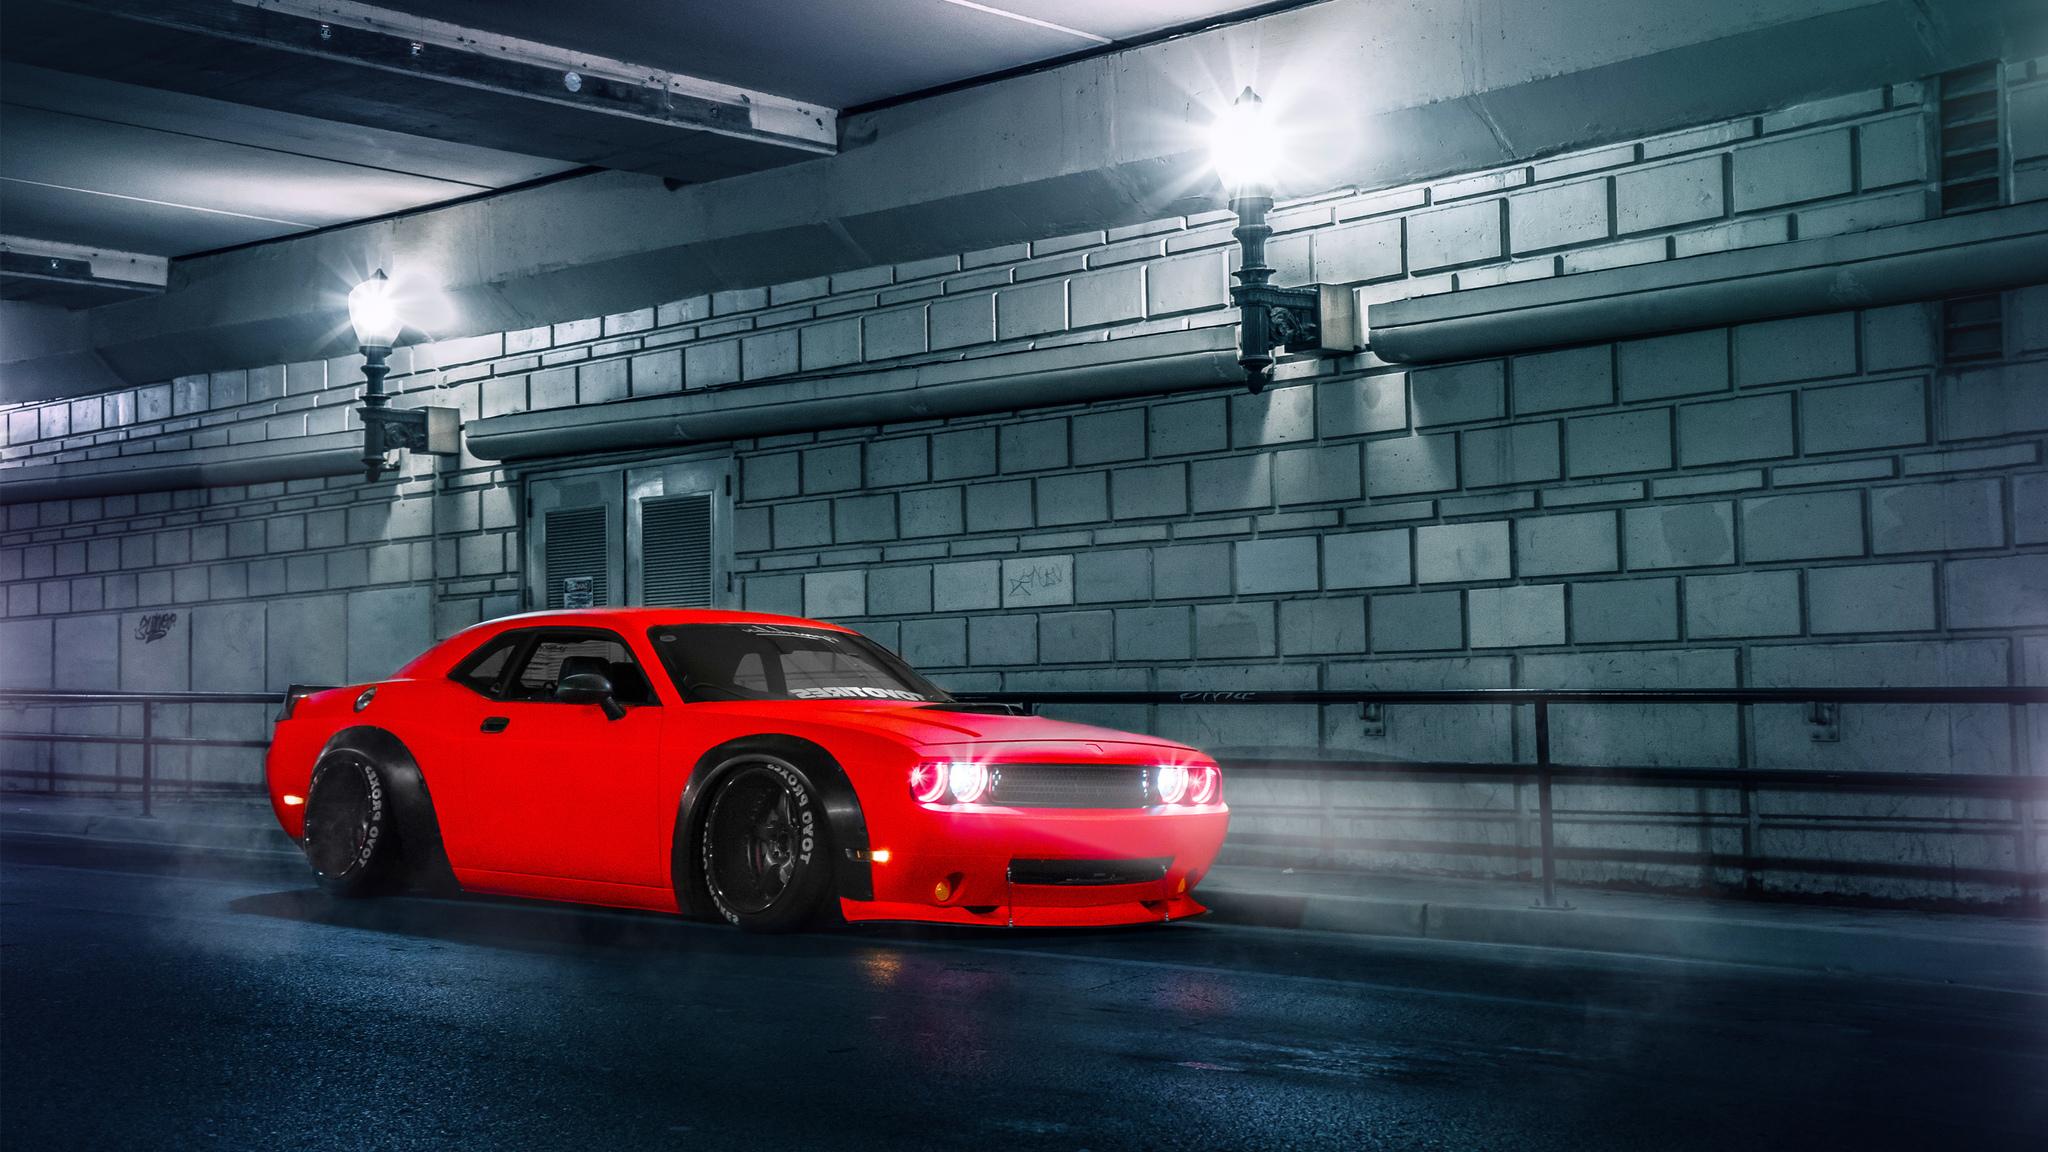 2015 Dodge Challenger SRT (2048x1152)